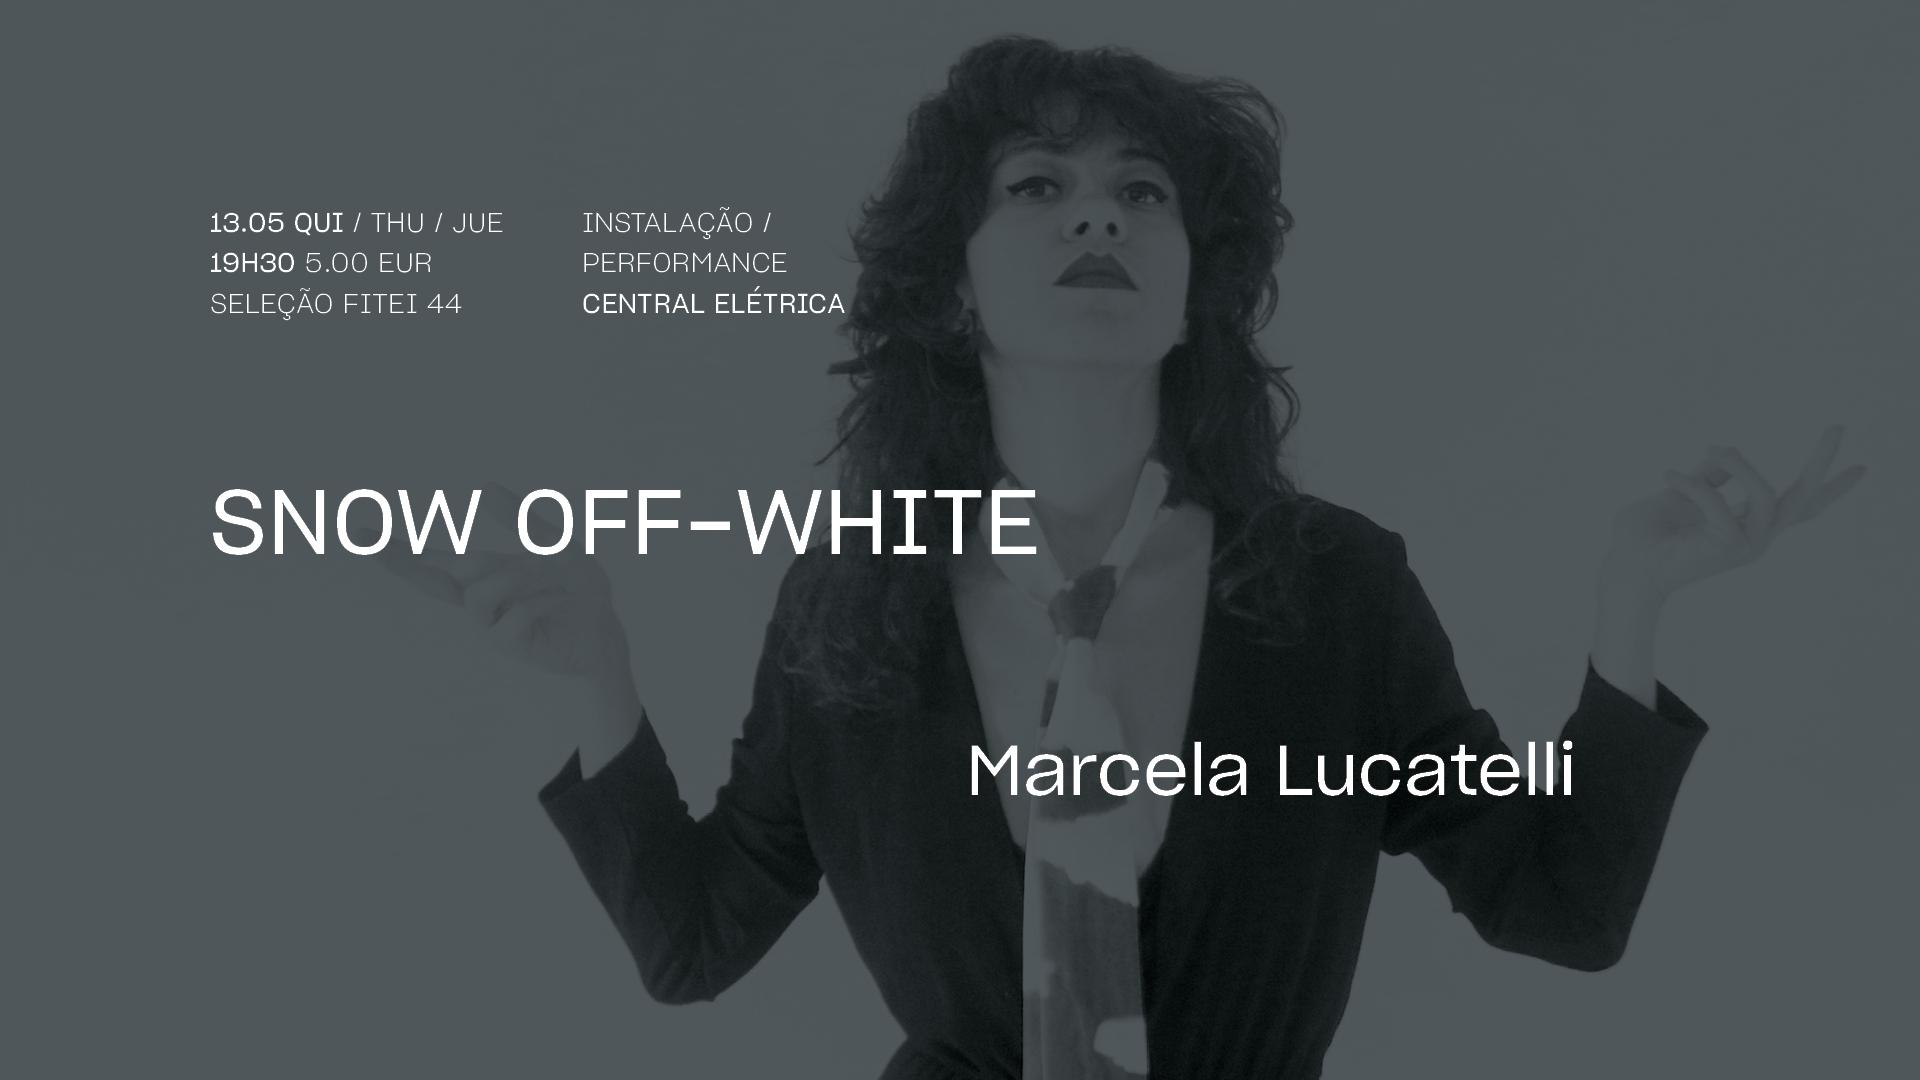 Snow Off-White • MARCELA LUCATELLI | Instalação / Performance | FITEI 44